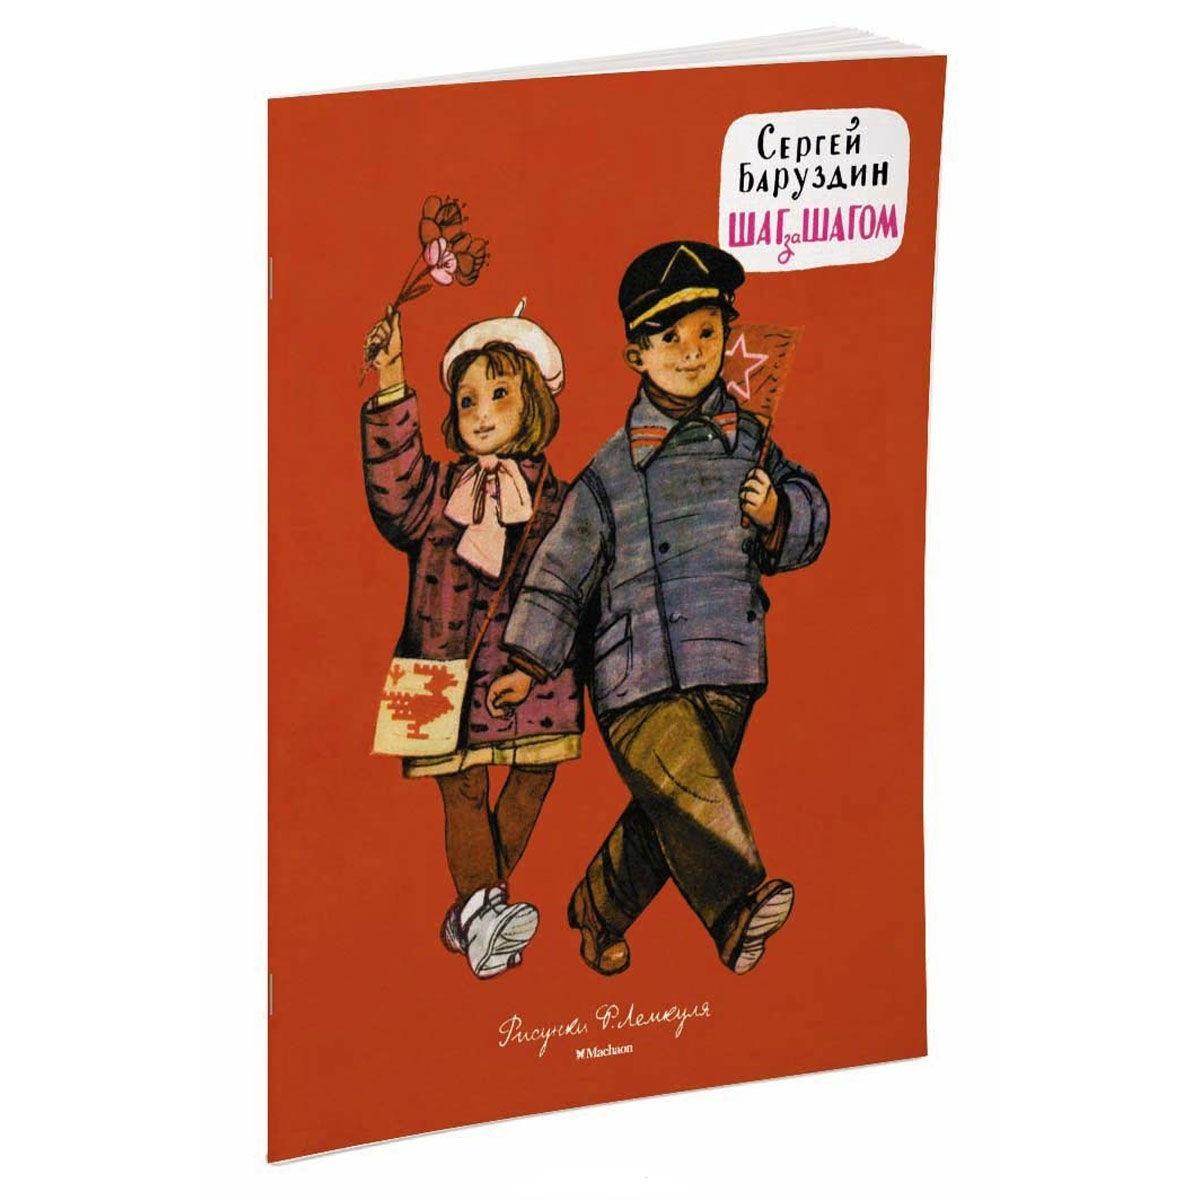 Книга Баруздин С. - Шаг за шагом. Рисунки Ф. ЛемкуляКлассная классика<br>Книга Баруздин С. - Шаг за шагом. Рисунки Ф. Лемкуля<br>